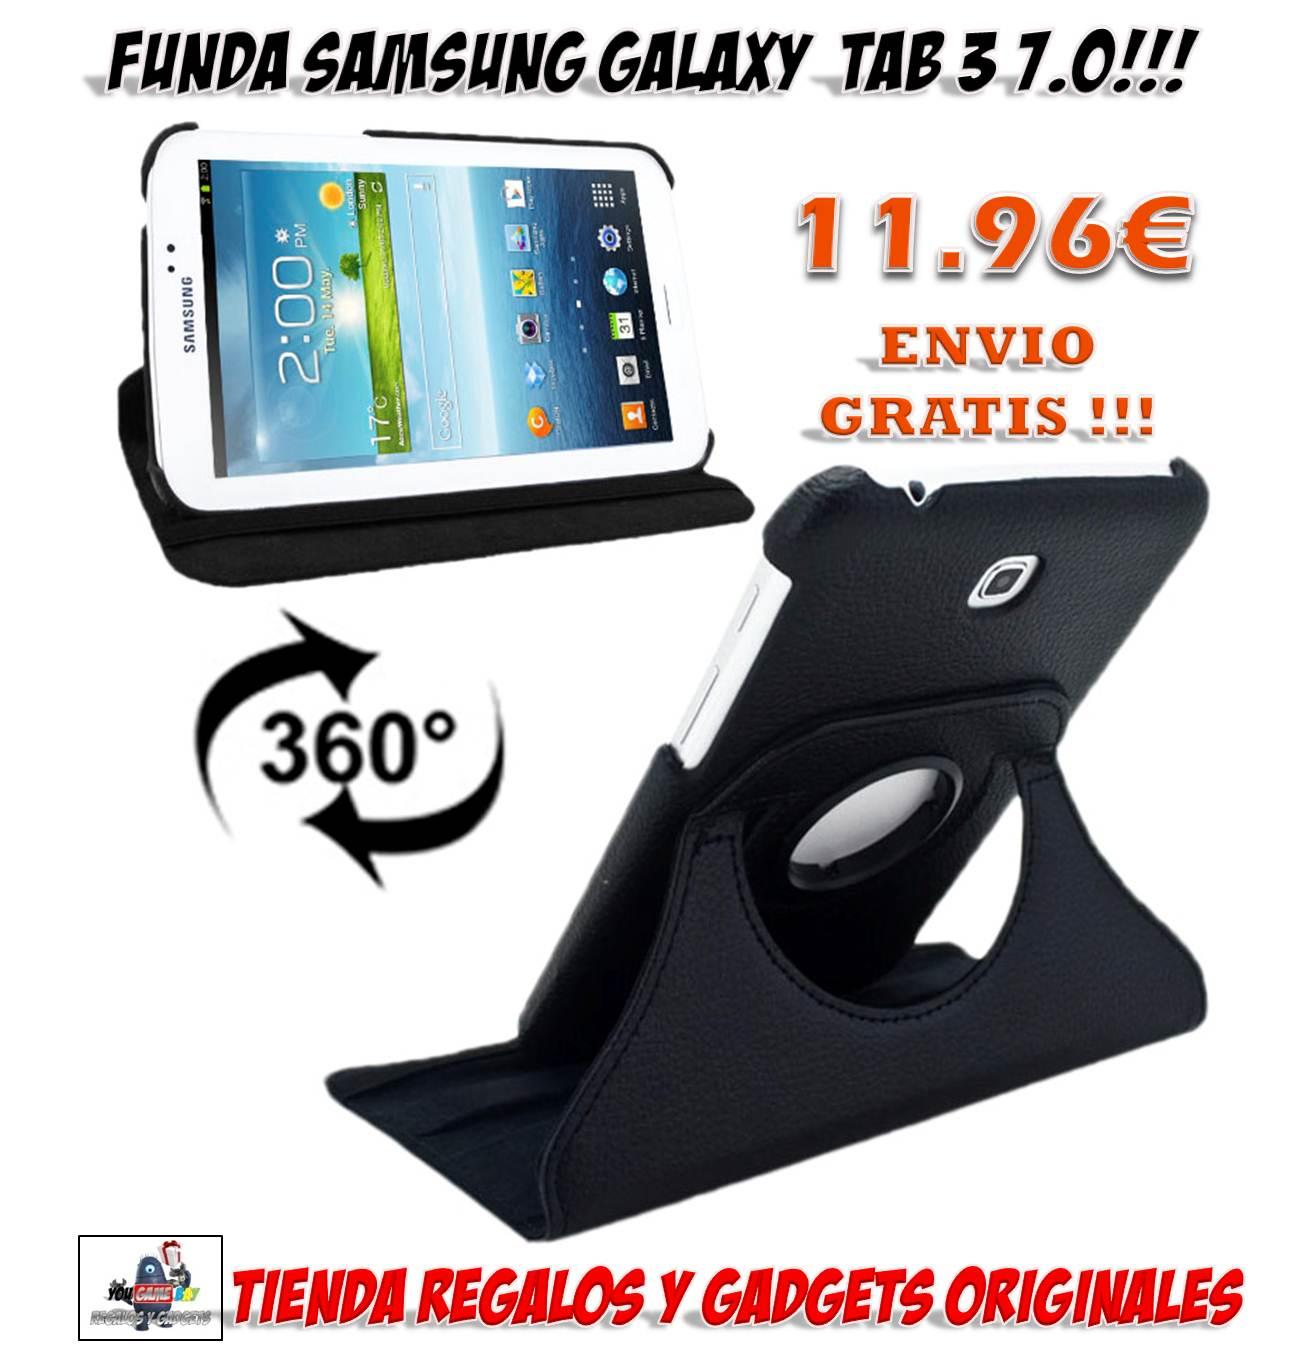 Funda giratoria tablet samsung galaxy tab 3 por solo euros accesorios - Funda samsung galaxy tab ...